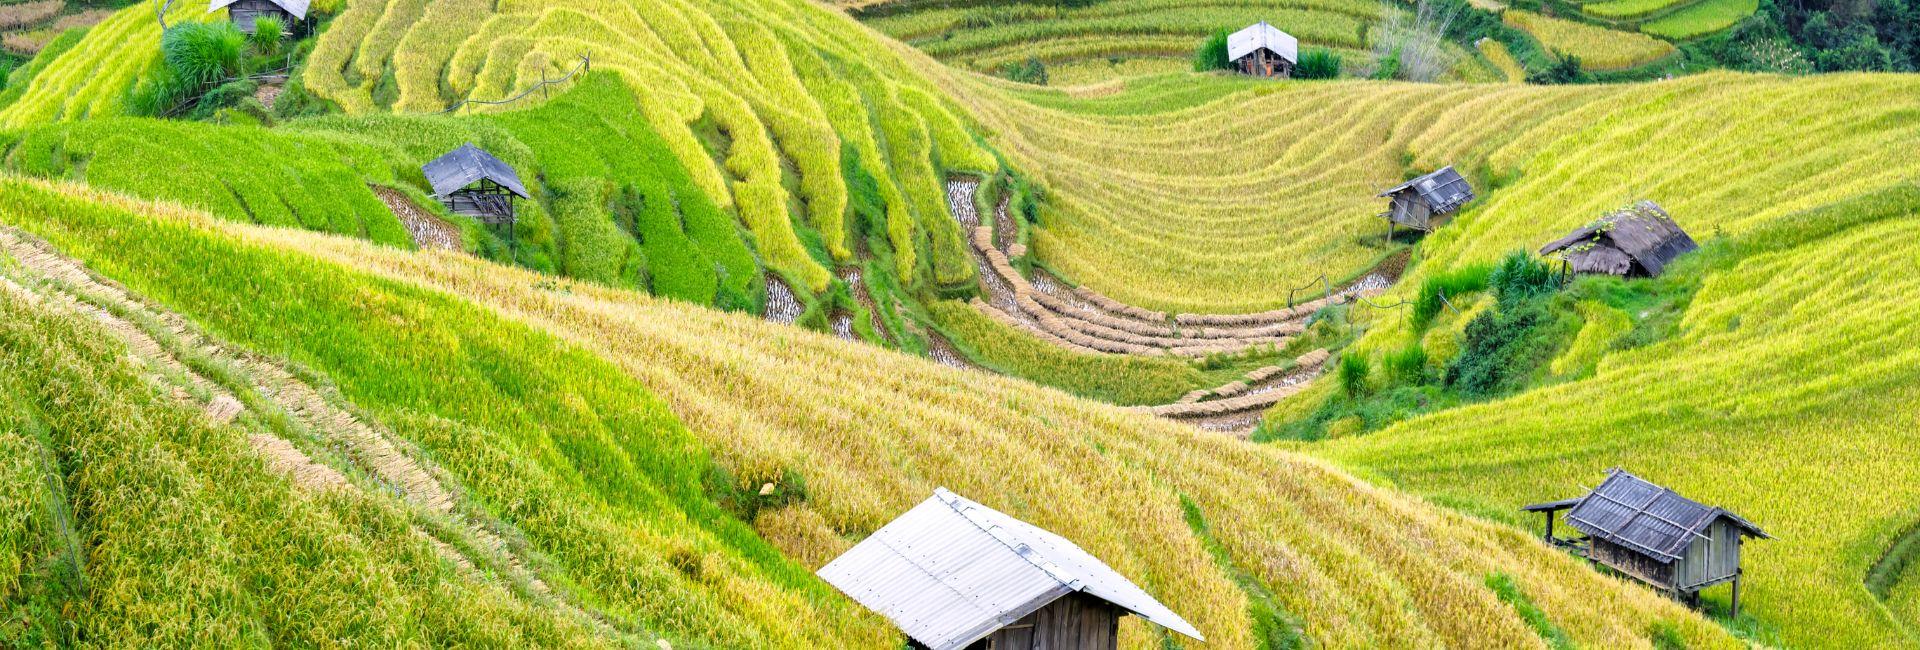 Trek entre splendide rizière en terrasse au Nord